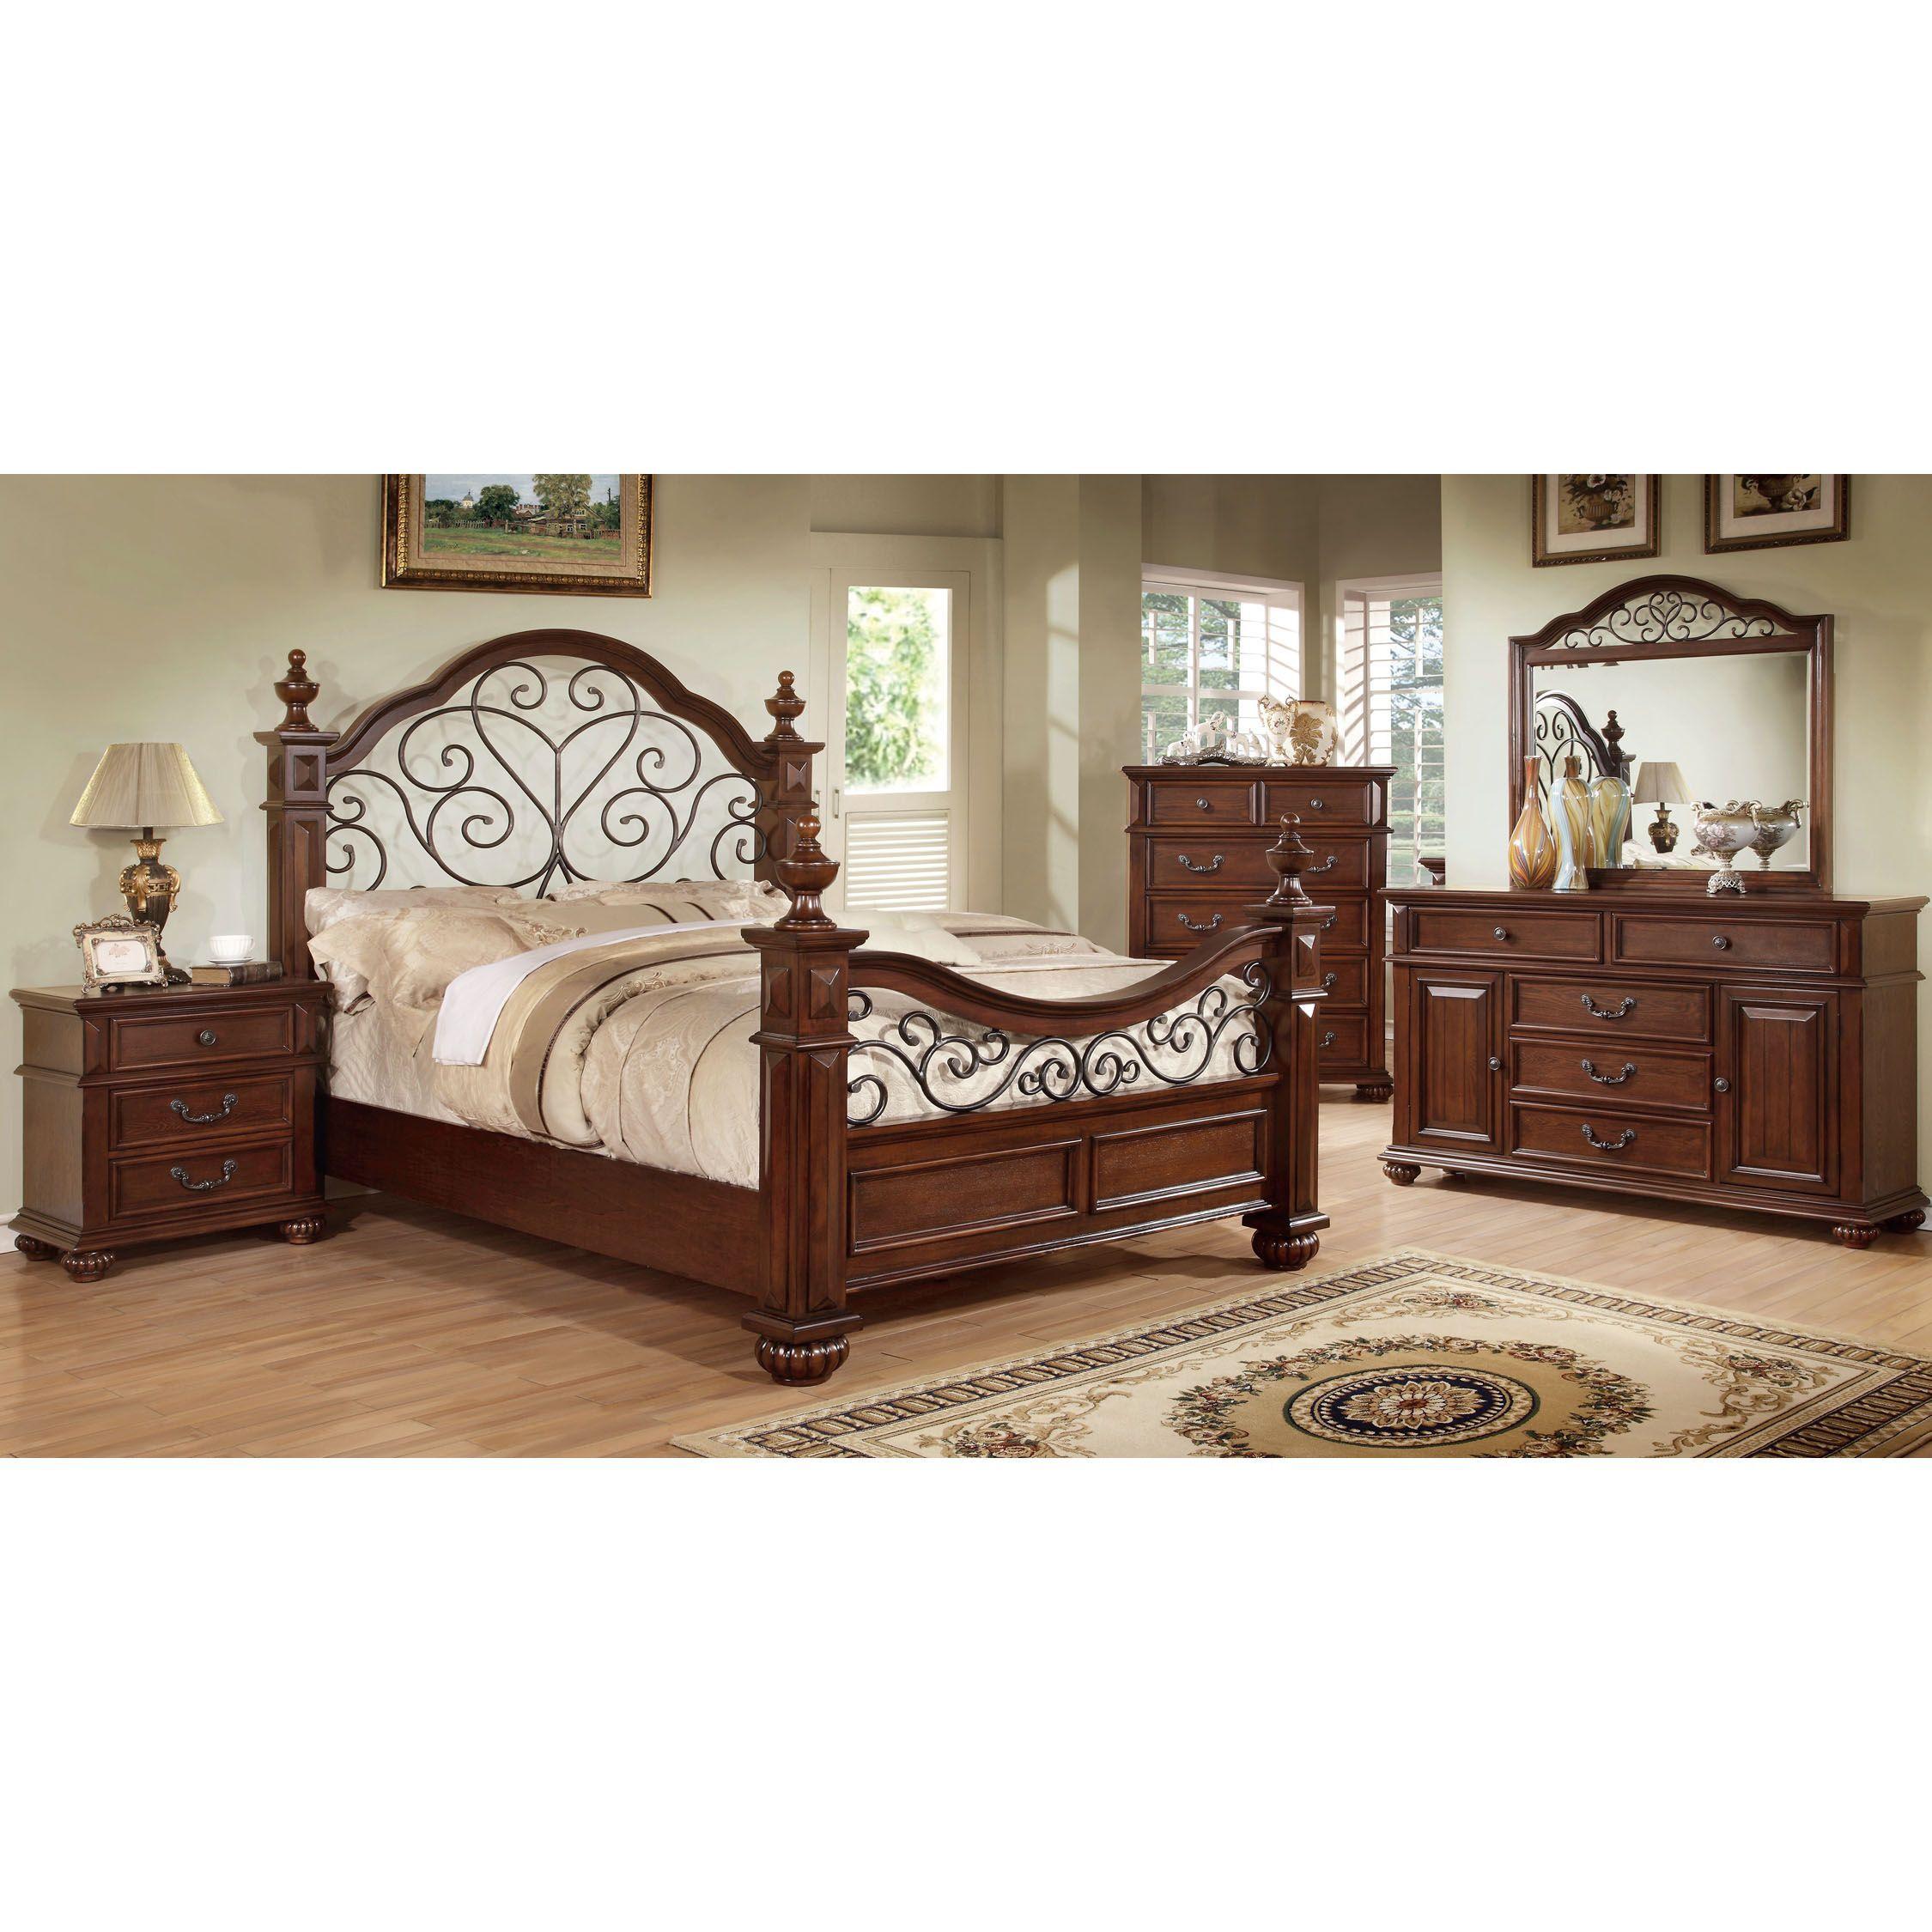 Furniture Of America Sumy Traditional Oak 4 Piece Bedroom Set King Bedroom Sets Bedroom Furniture Sets Bedroom Set